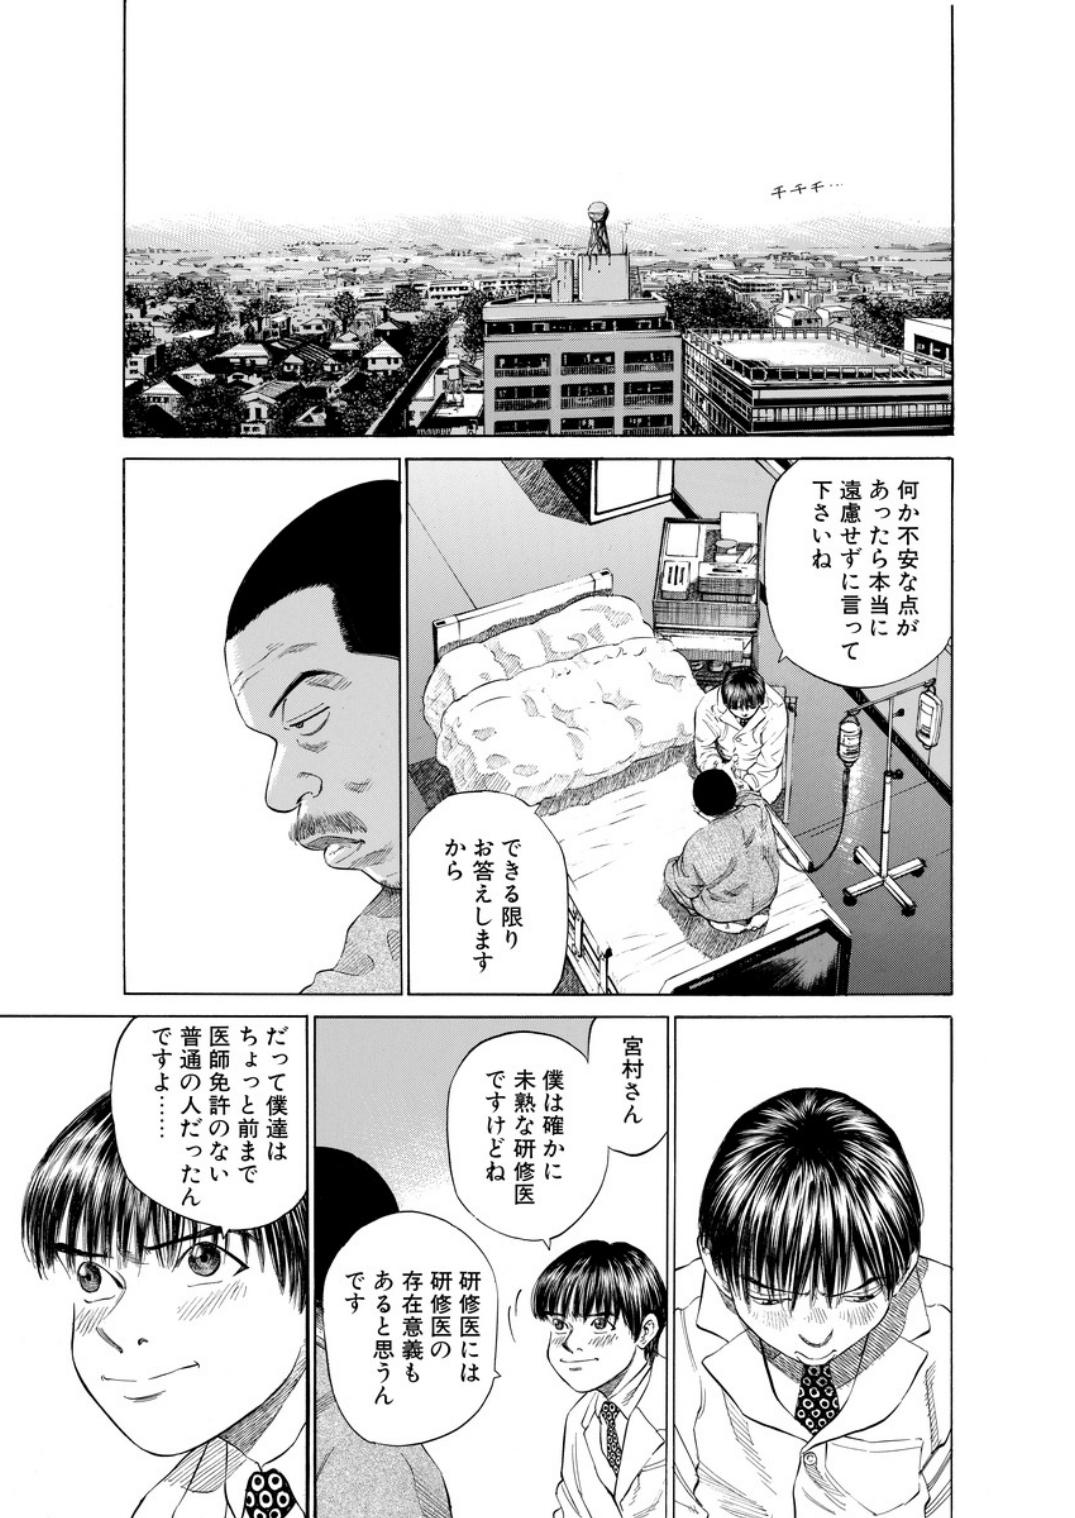 001bj_page-0179.jpg